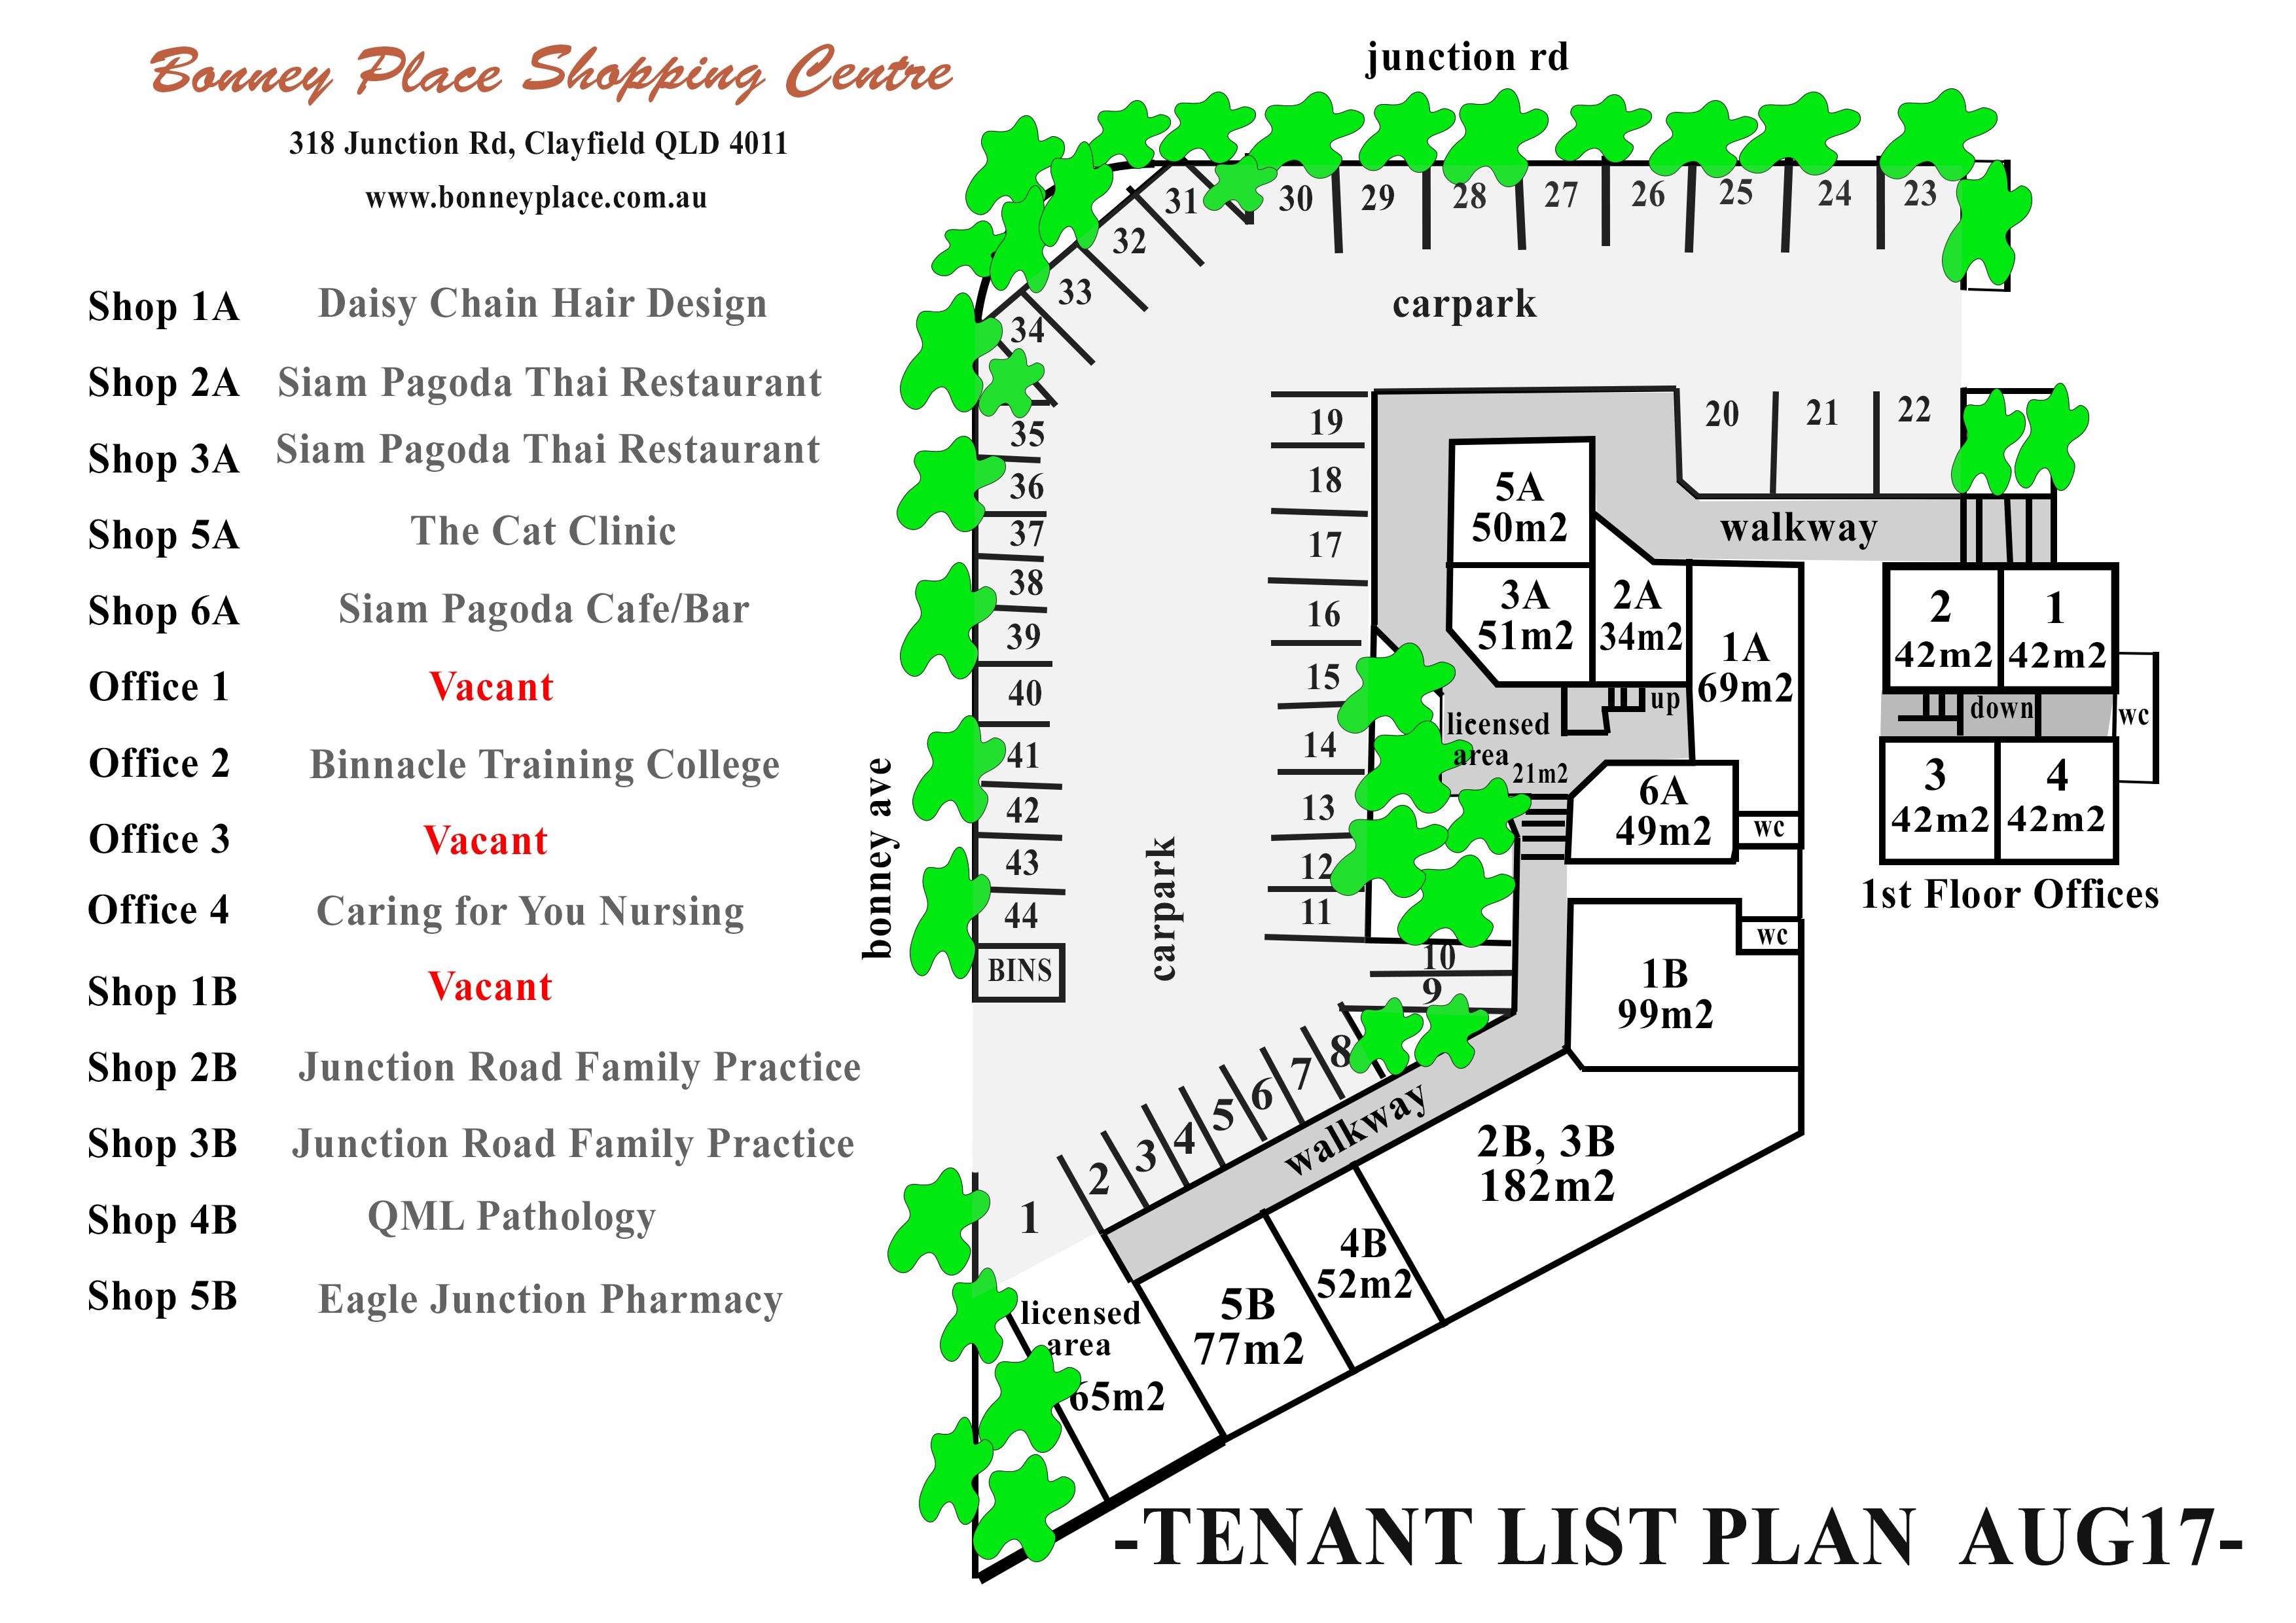 clayfield-tenant-plan-aug17